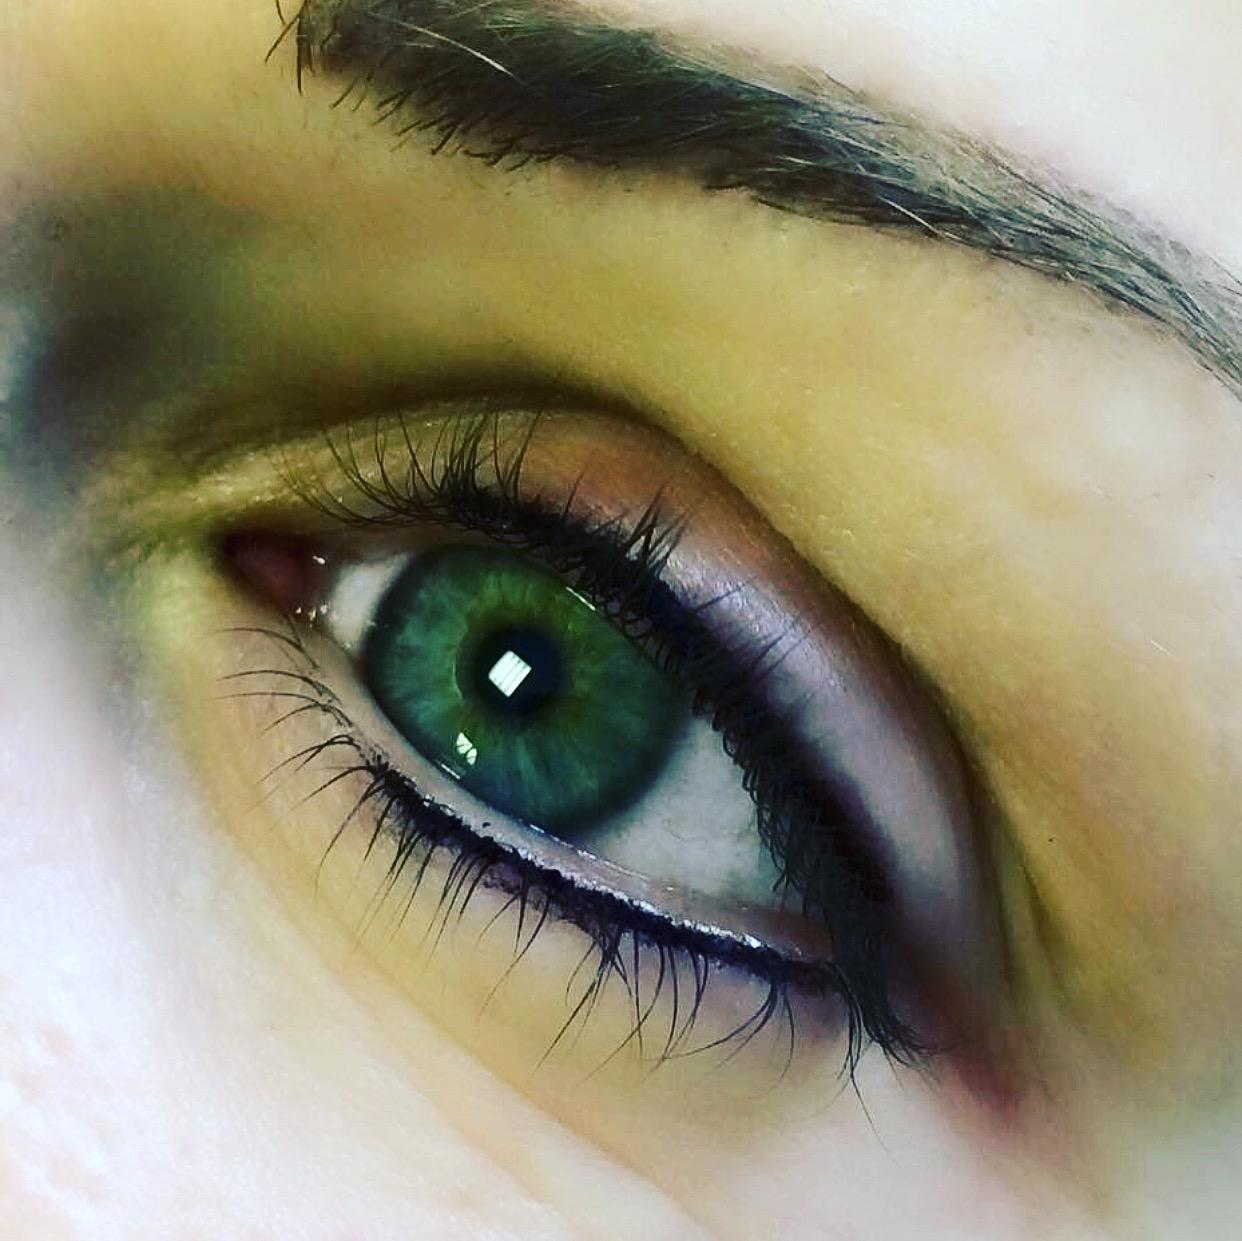 Smokey and smudgy eyeliner